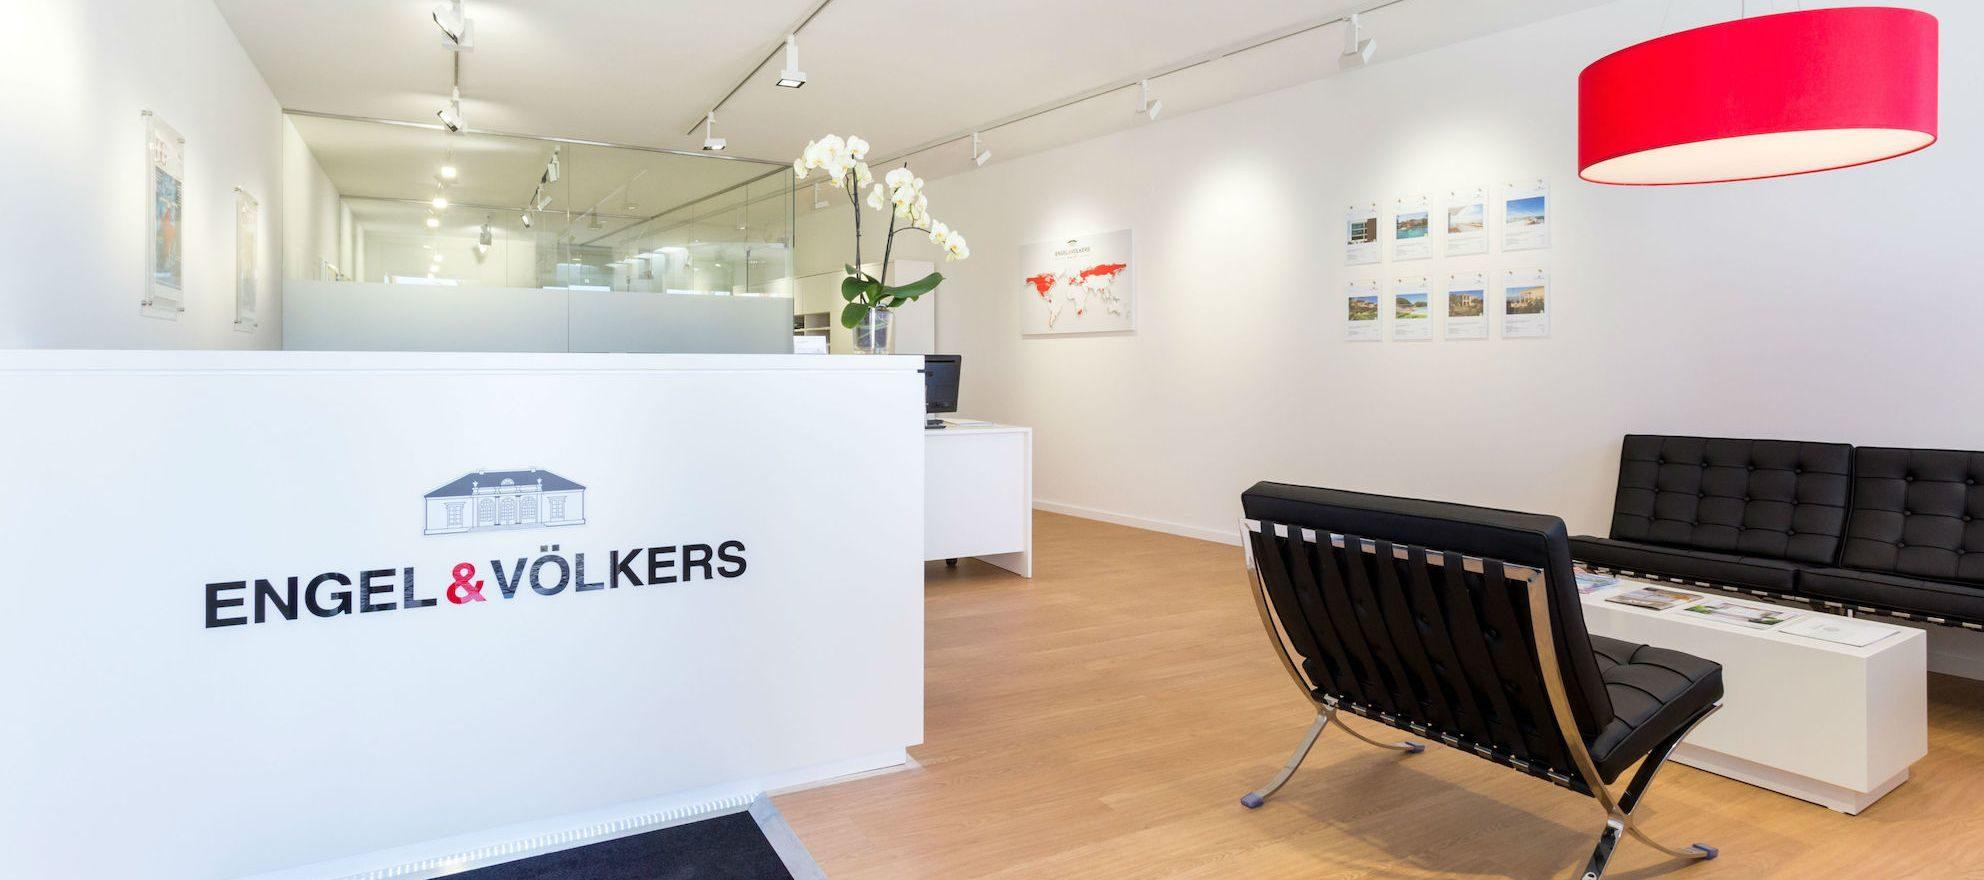 Engel & Völkers continues US expansion